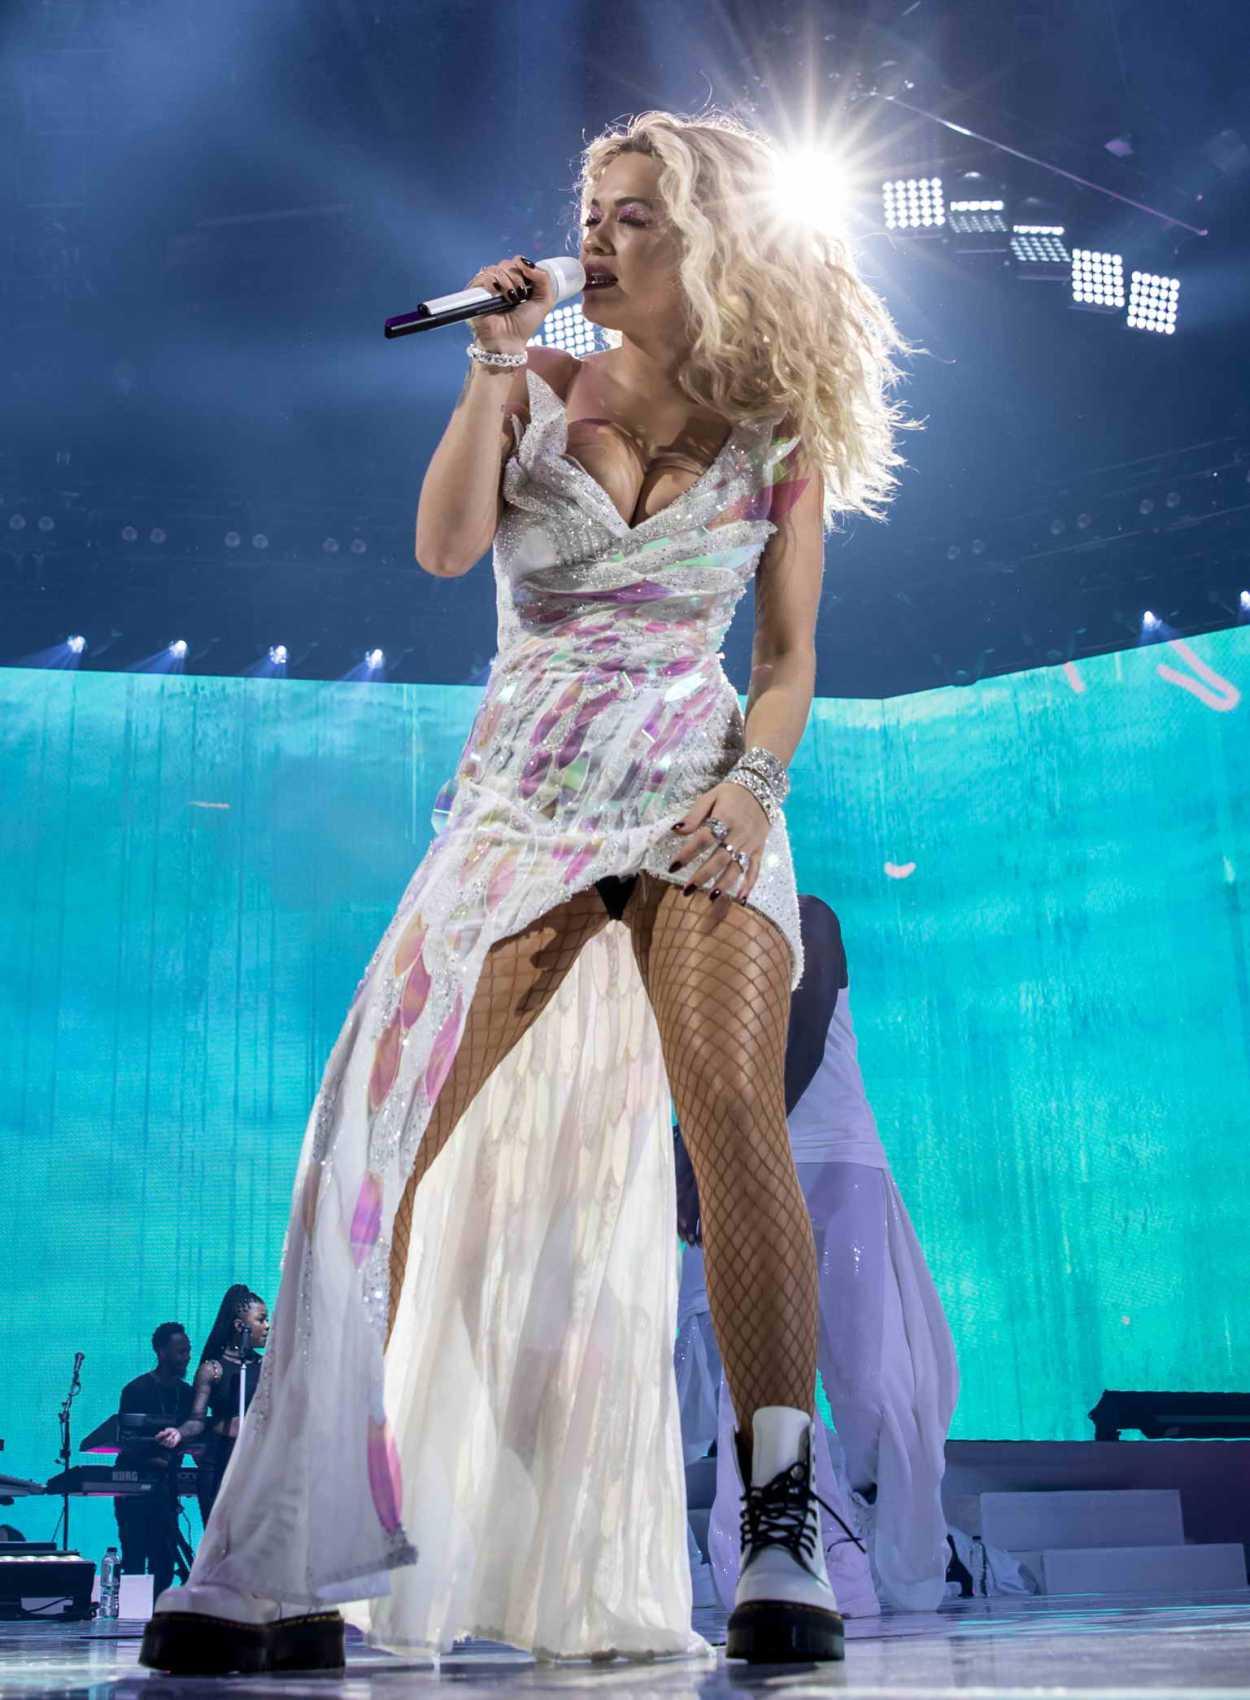 Rita Ora Performs Live At The Bournemouth International